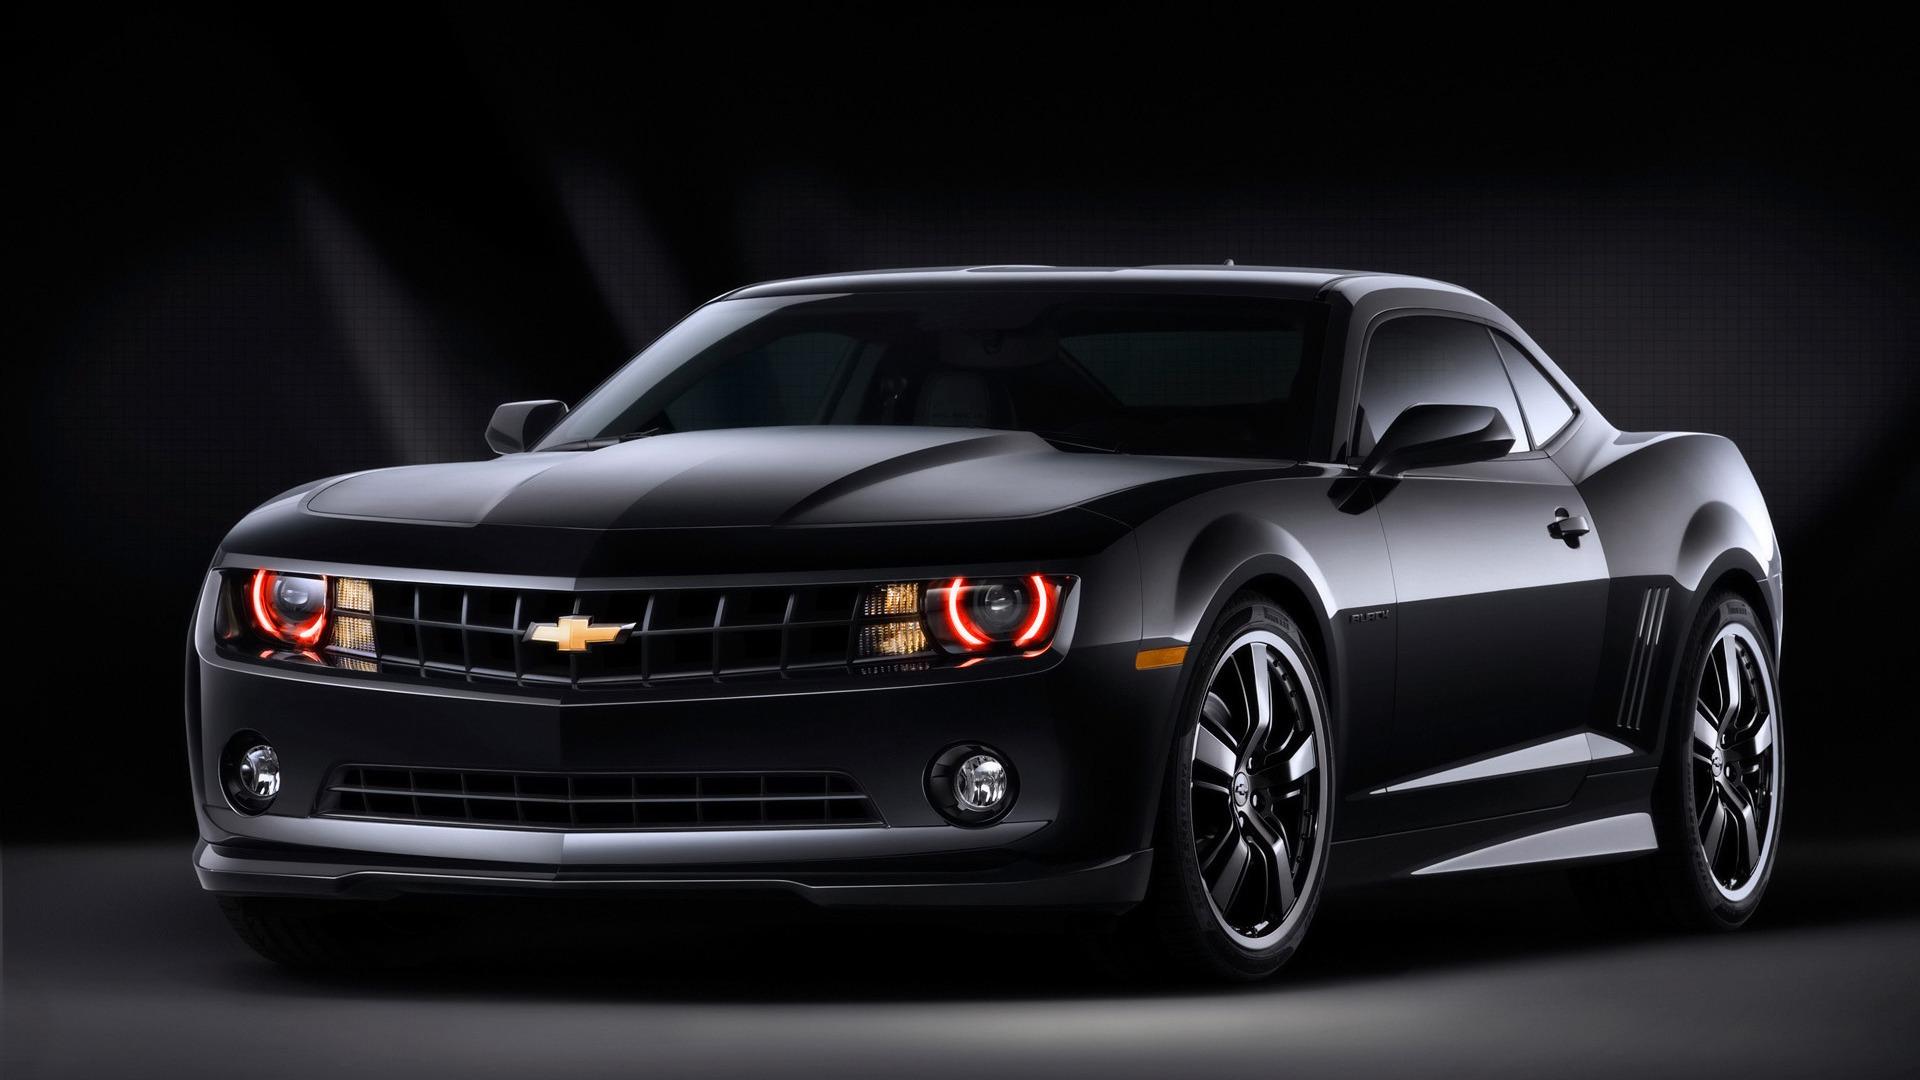 Cars Full HD Wallpapers 1080p wallpaper.wiki